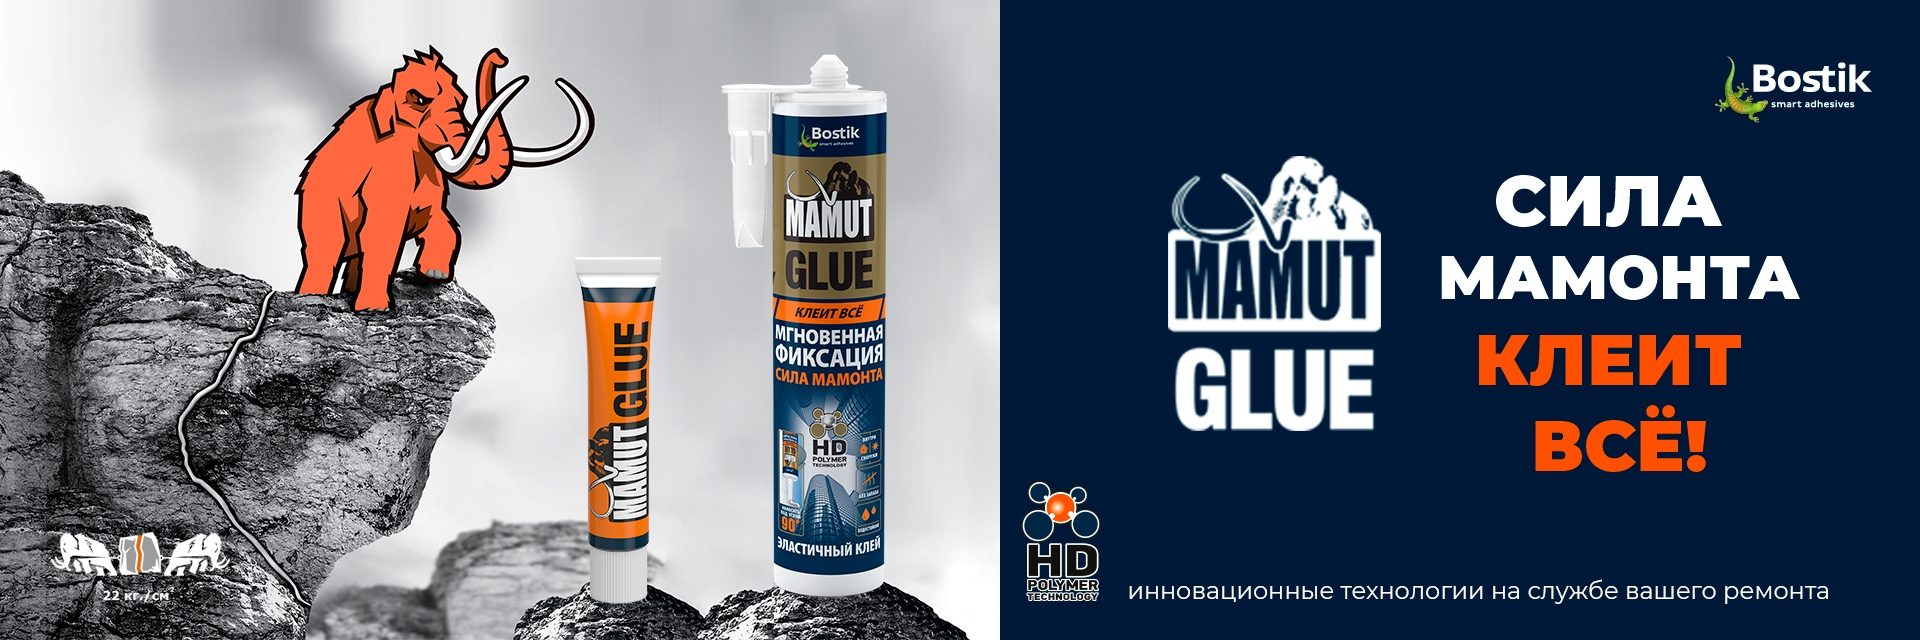 Bostik DIY Russia Campaign Mamut banner image